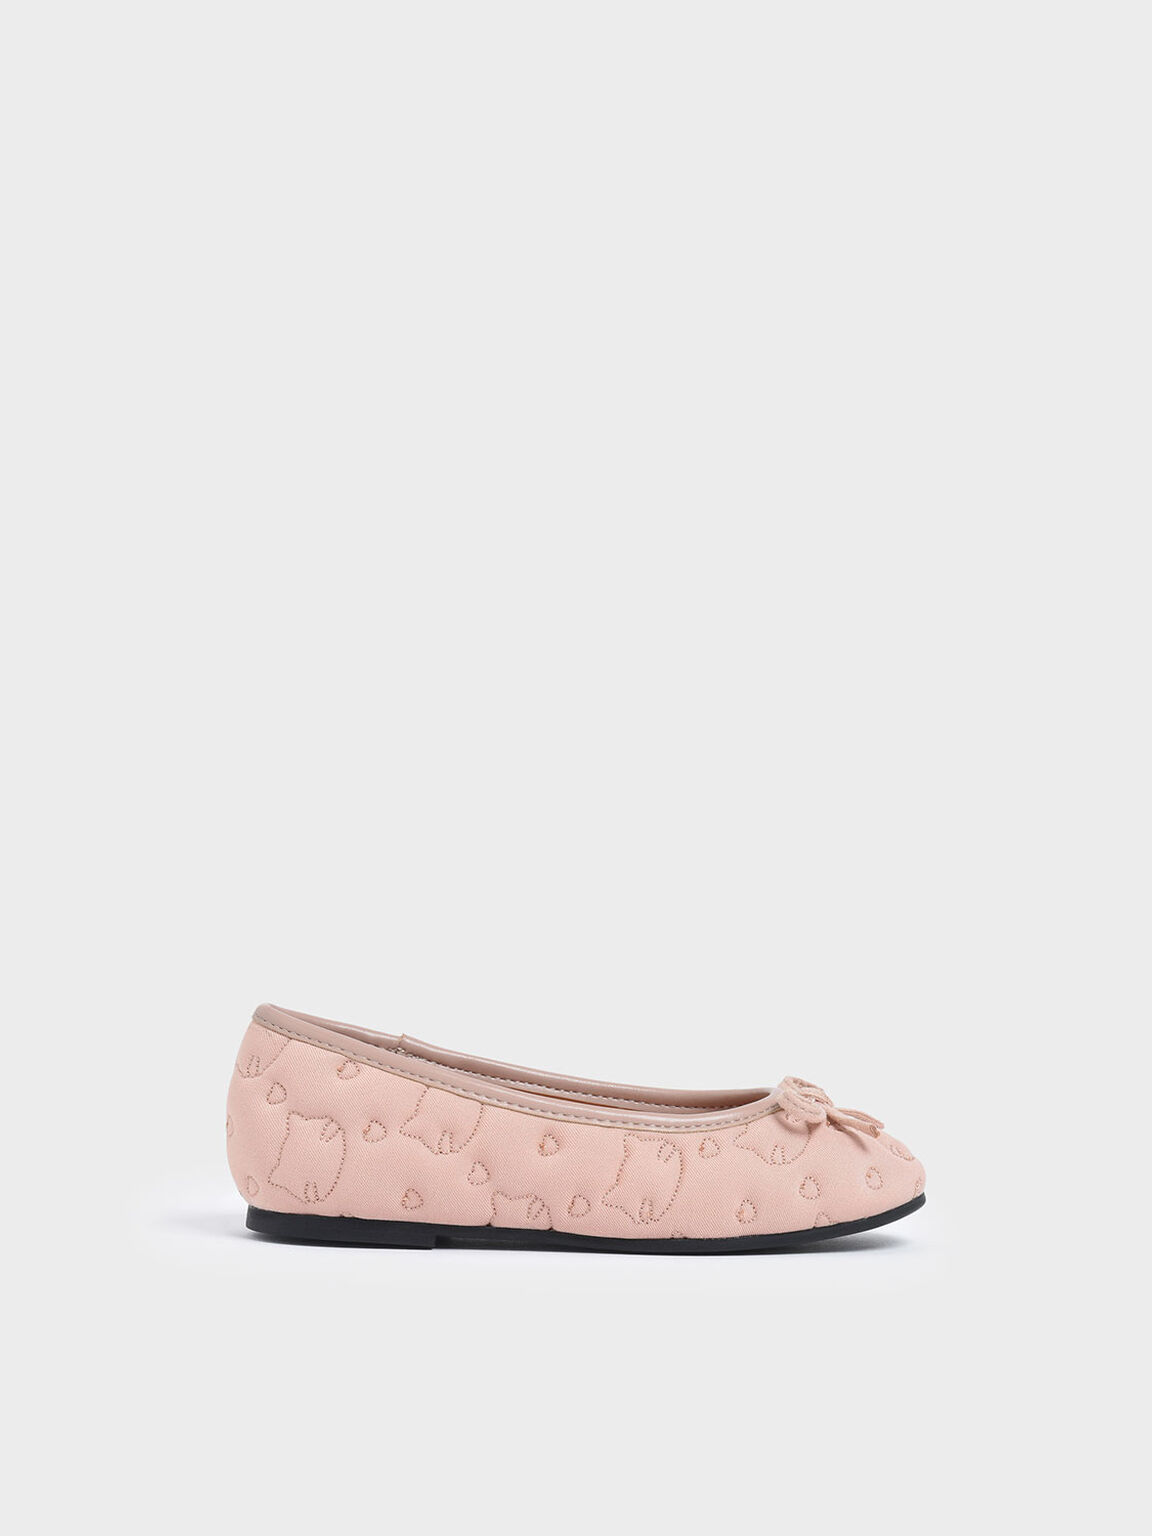 Girls' Cat Print Satin Ballerinas, Pink, hi-res